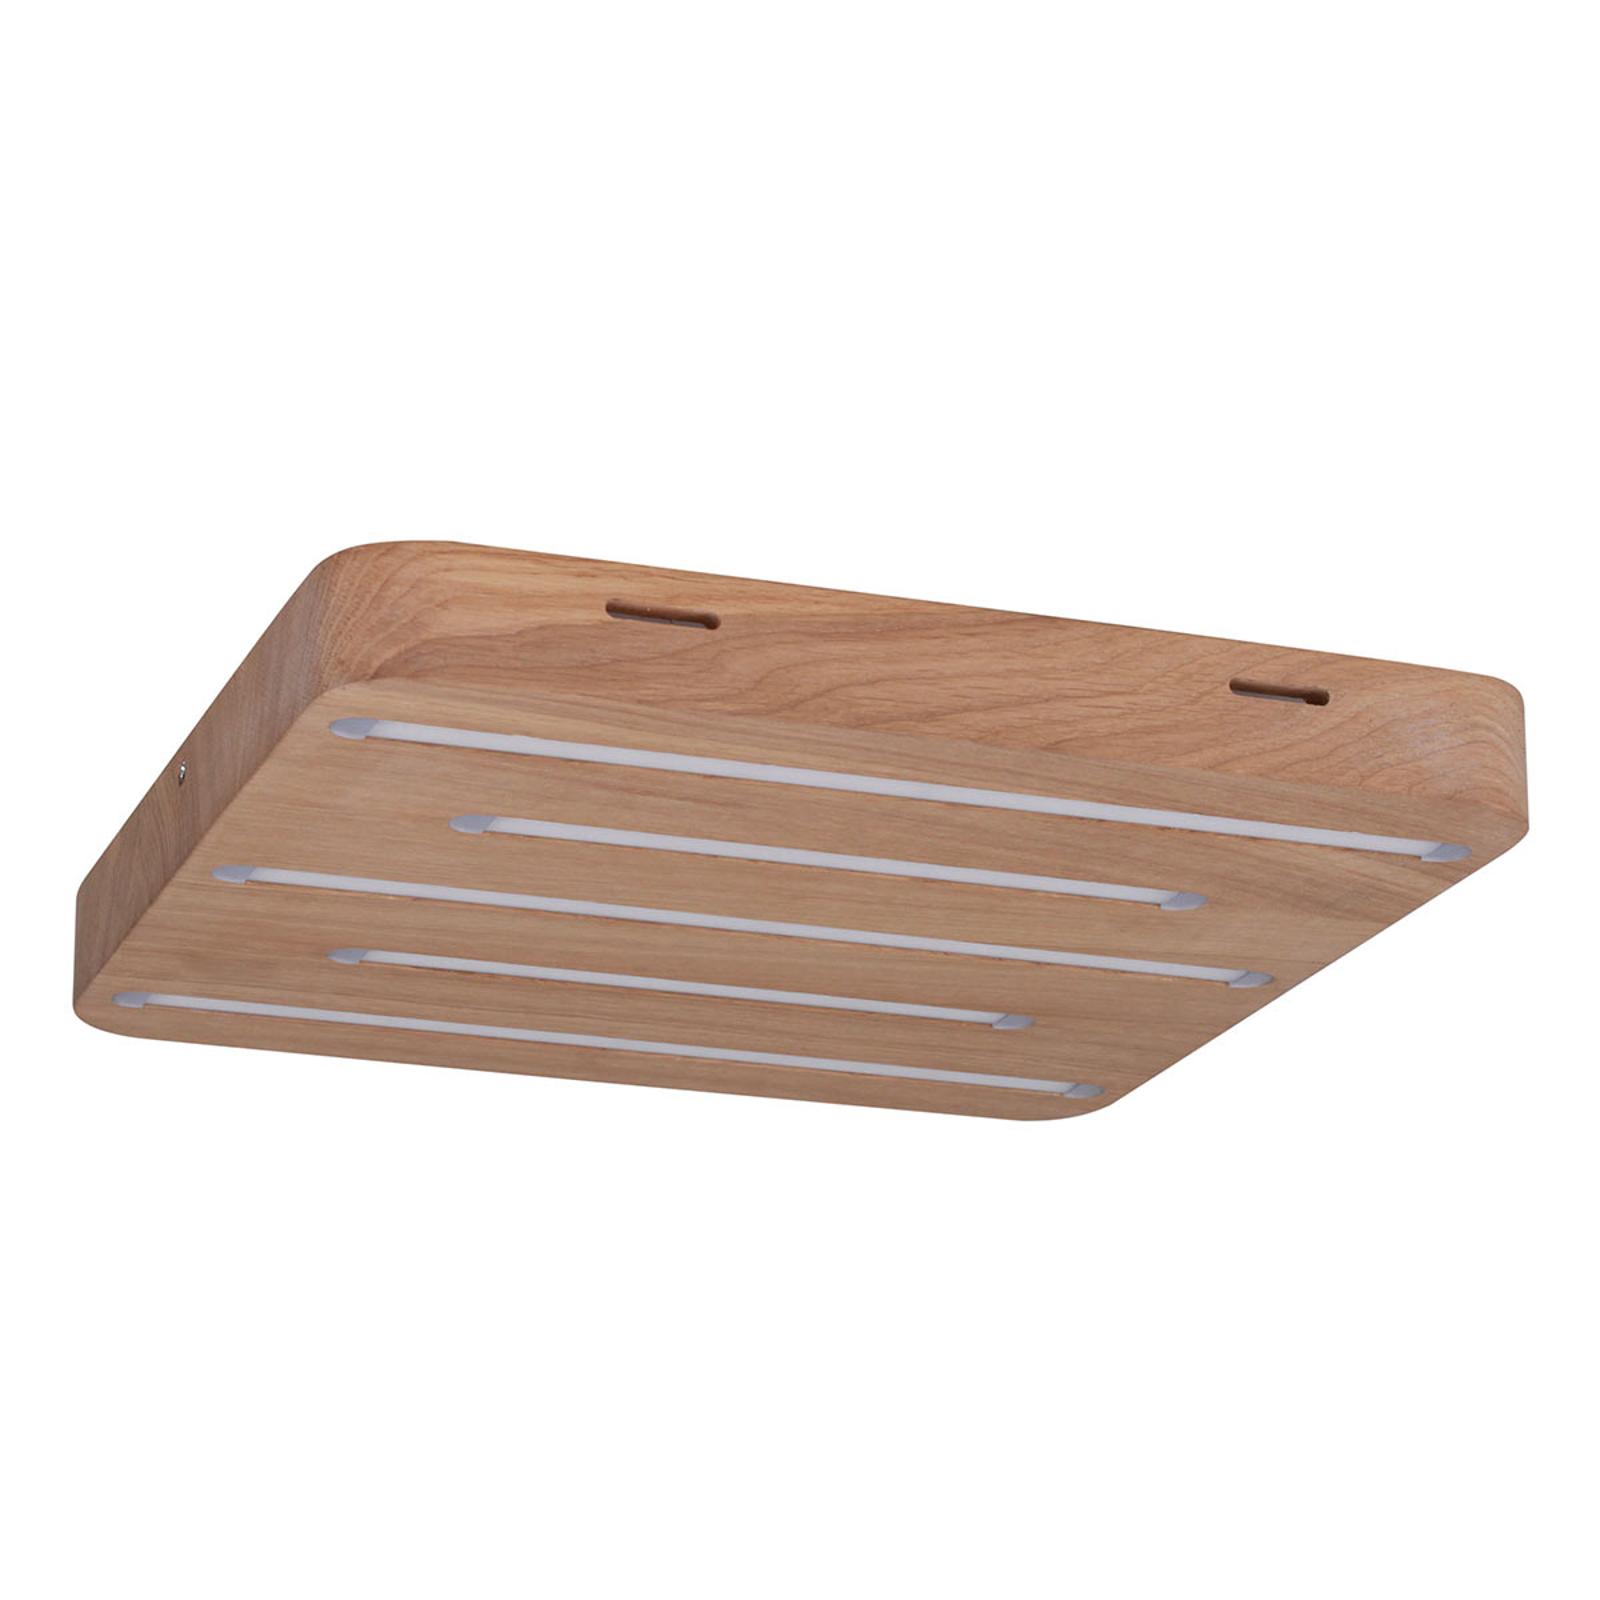 Nelikulmainen LED-kattolamppu Plafond Holz